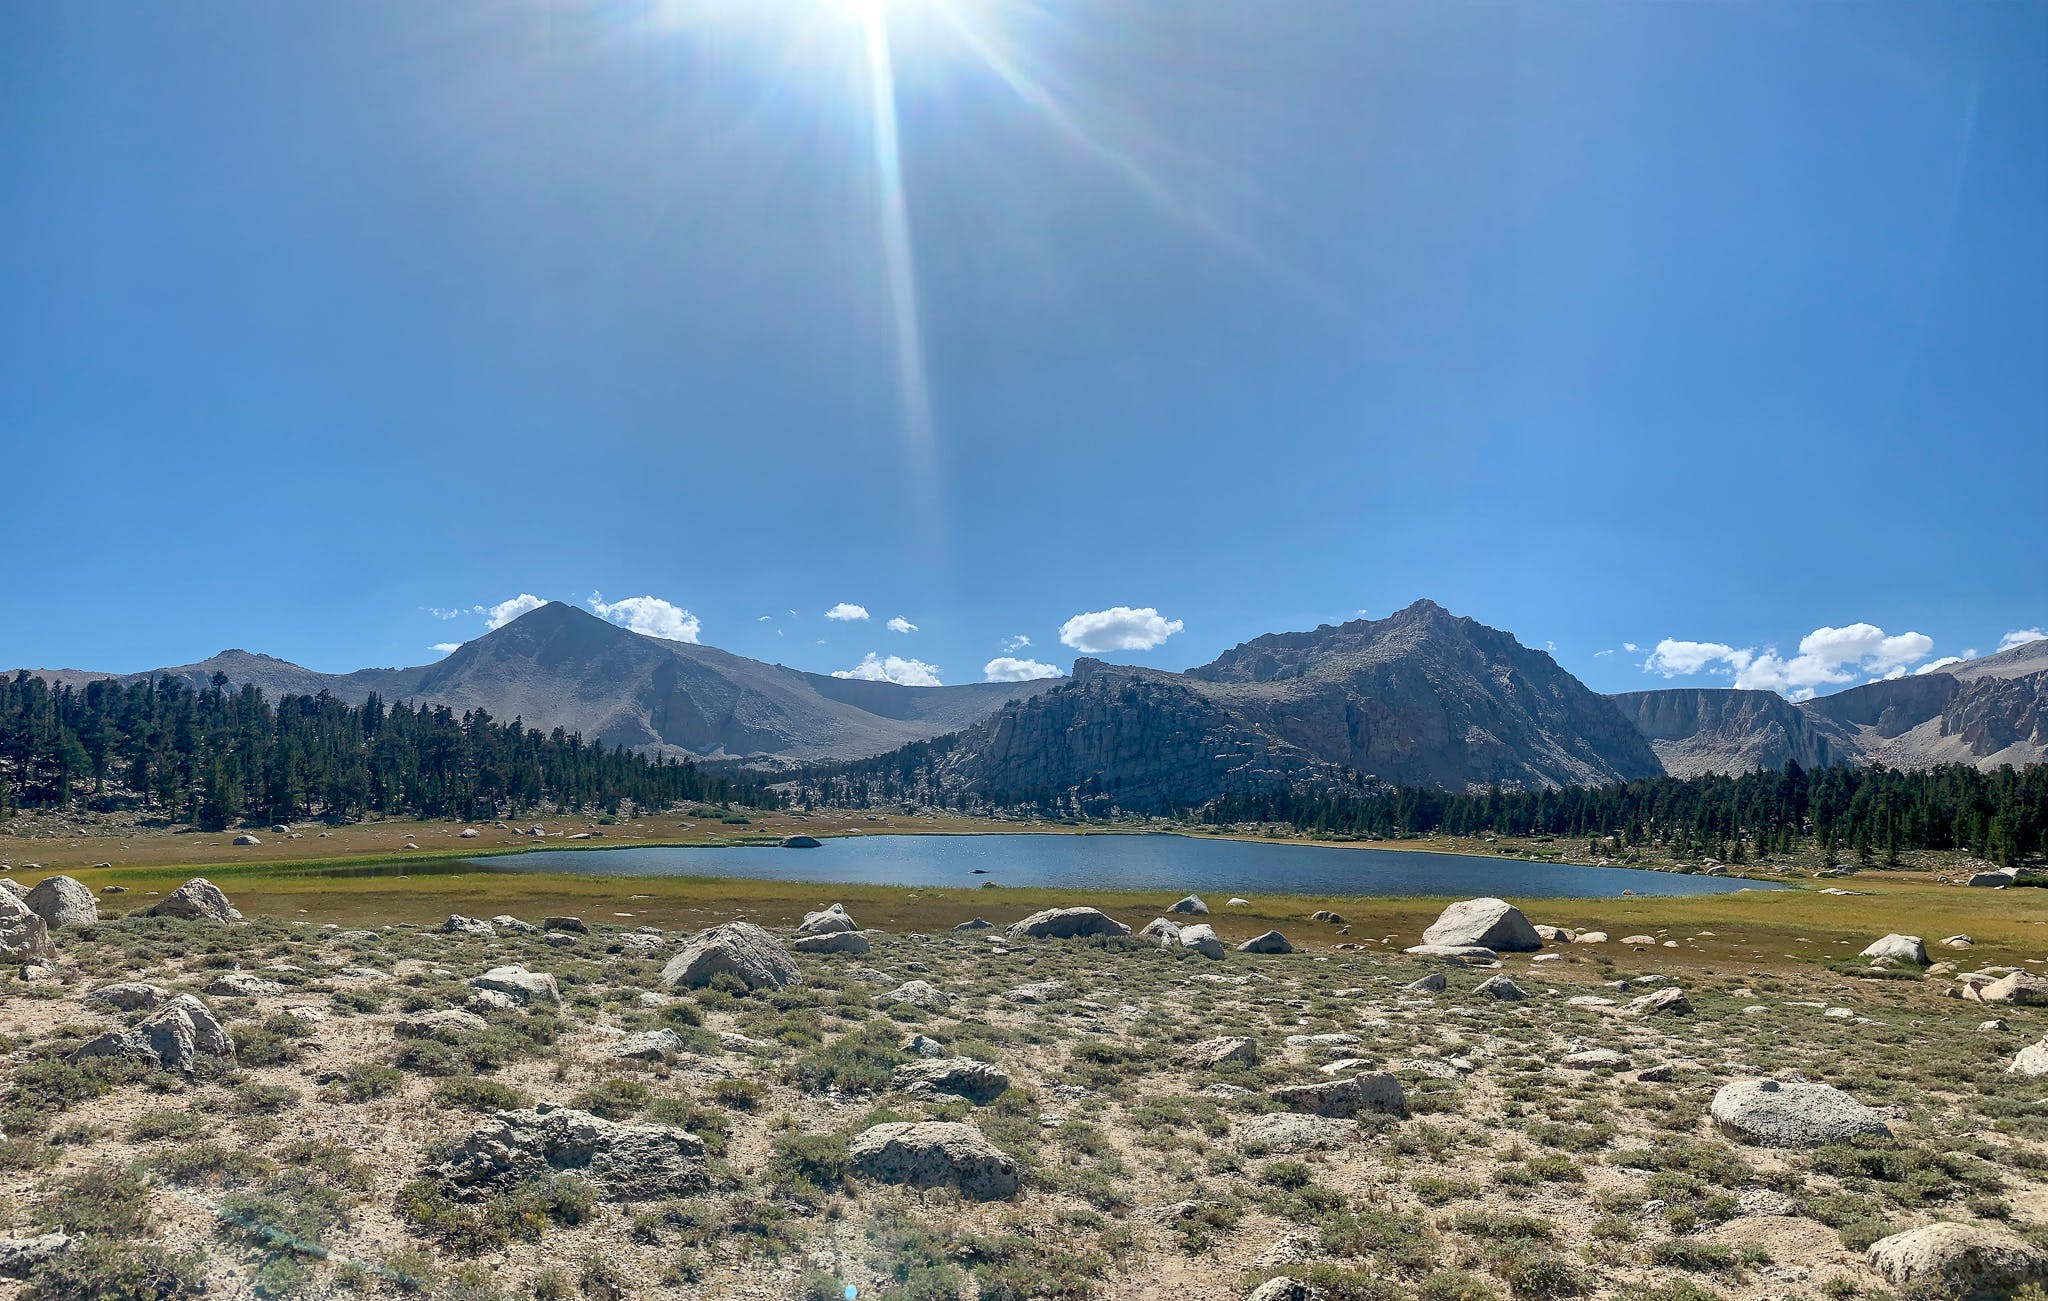 Hike to Cottonwood Lakes in the John Muir Wilderness